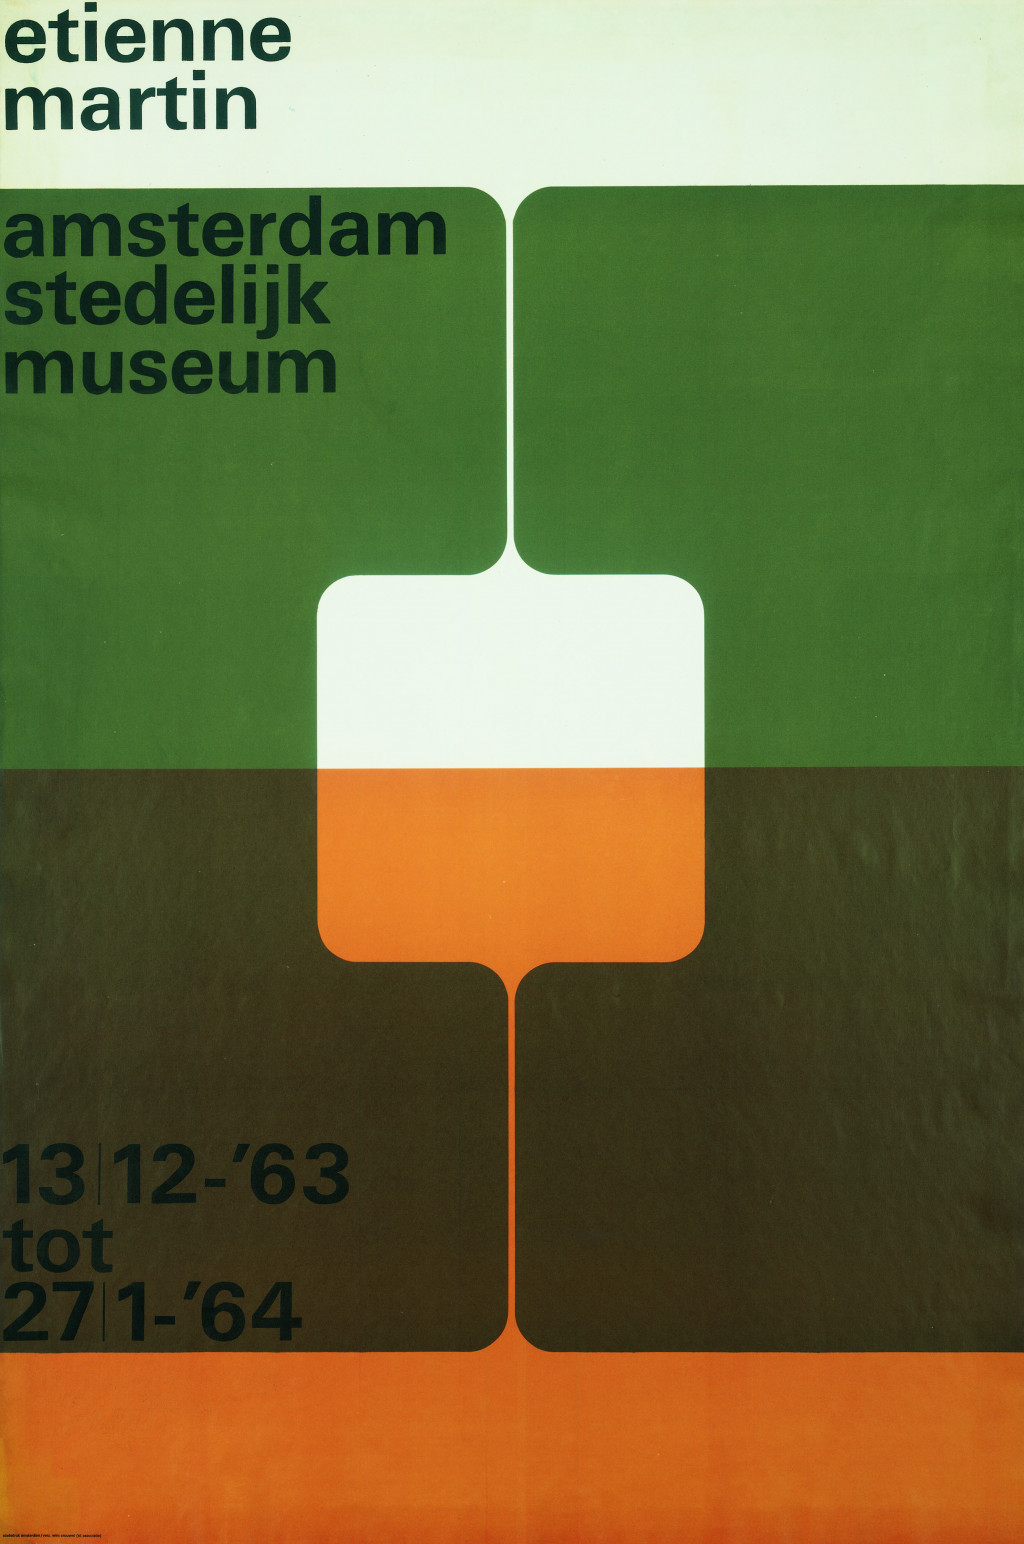 Wim Crouwel, 'Etienne Martin', 1963. Collection Stedelijk Museum Amsterdam